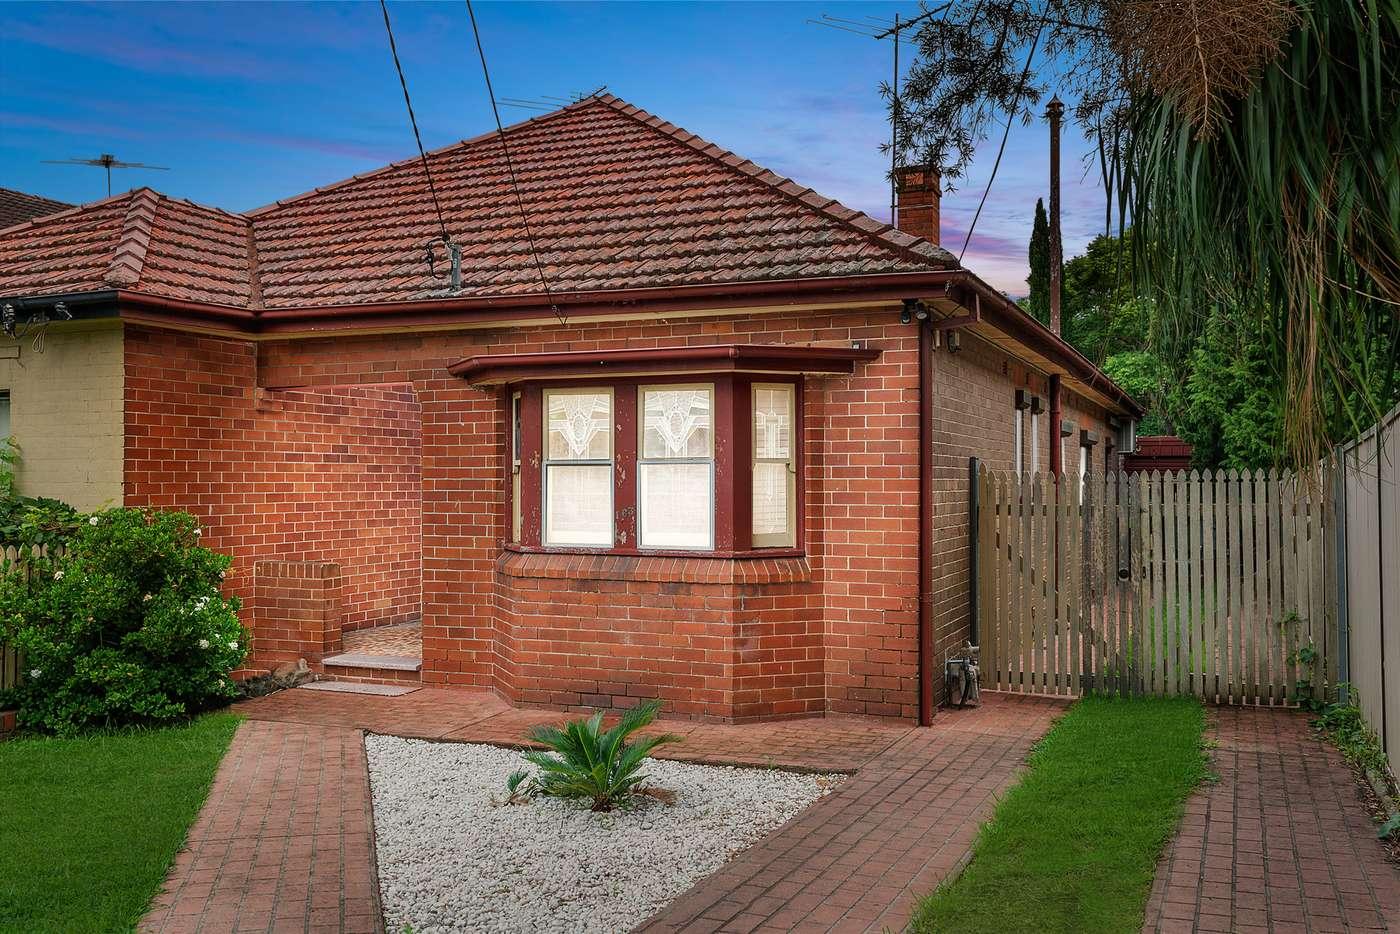 Main view of Homely house listing, 163 Croydon Avenue, Croydon Park NSW 2133